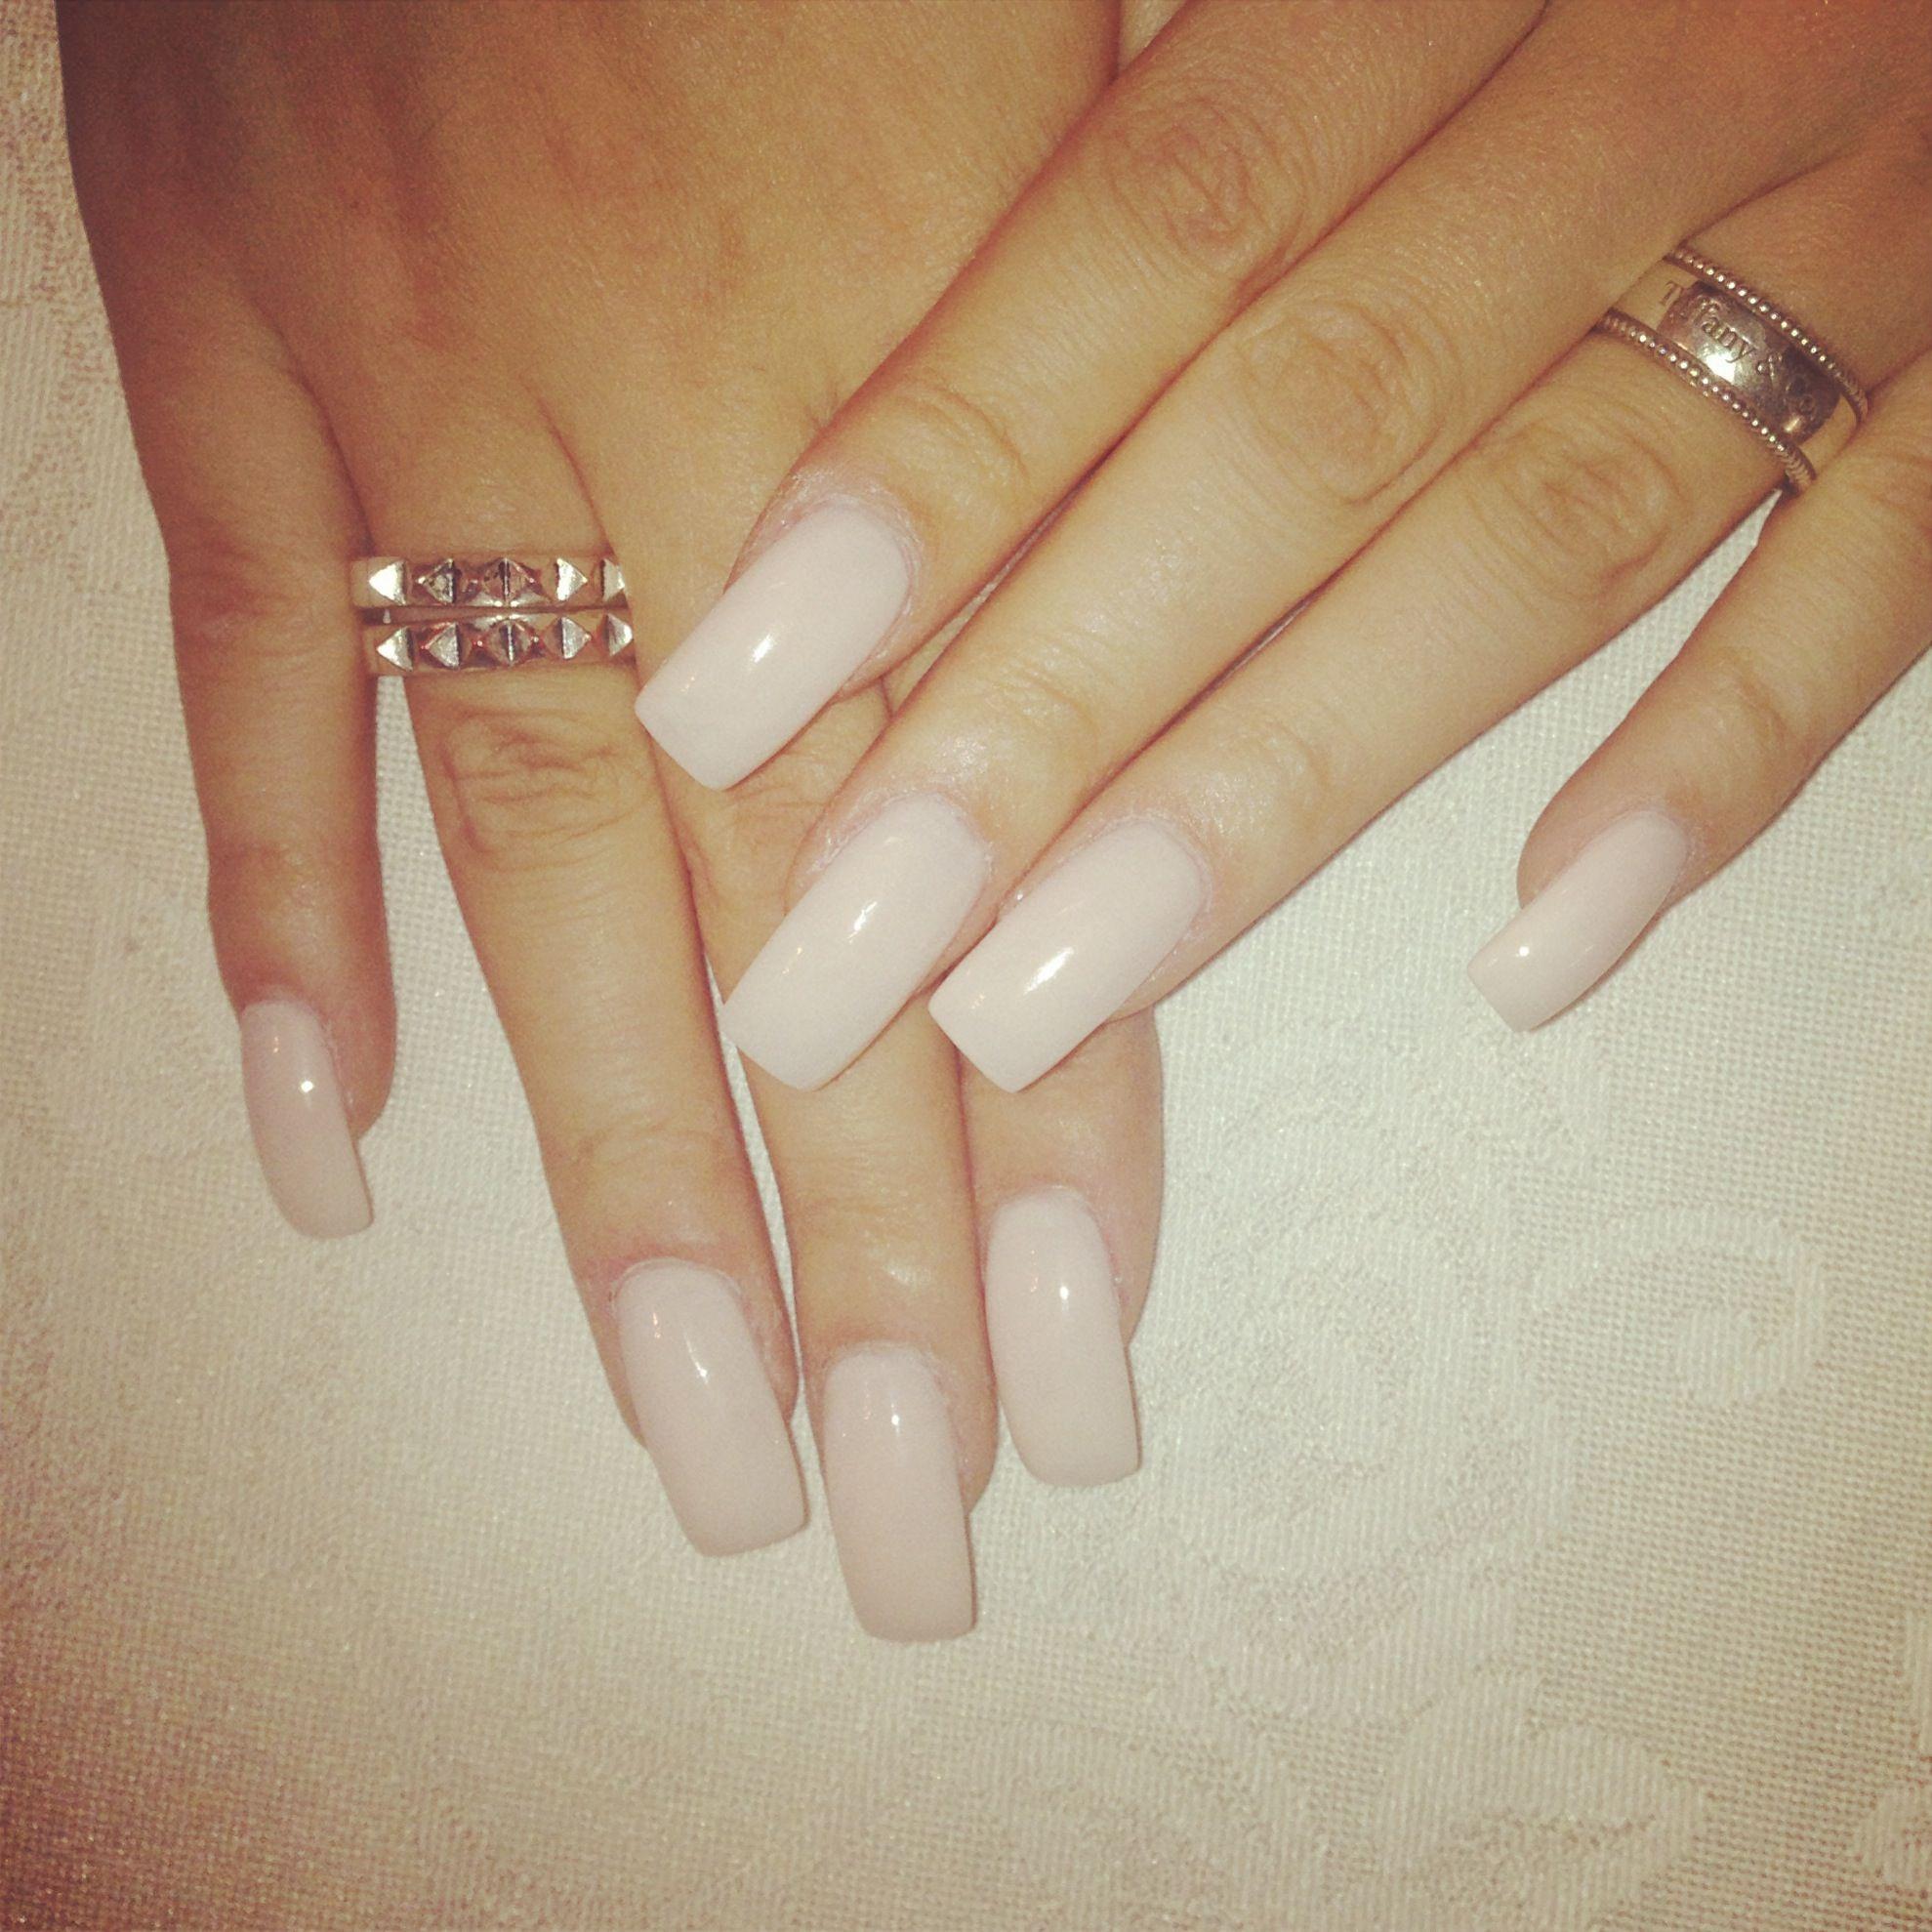 Khloe Kardashian & Kylie Jenner inspired nails. #kardashian #jenner ...